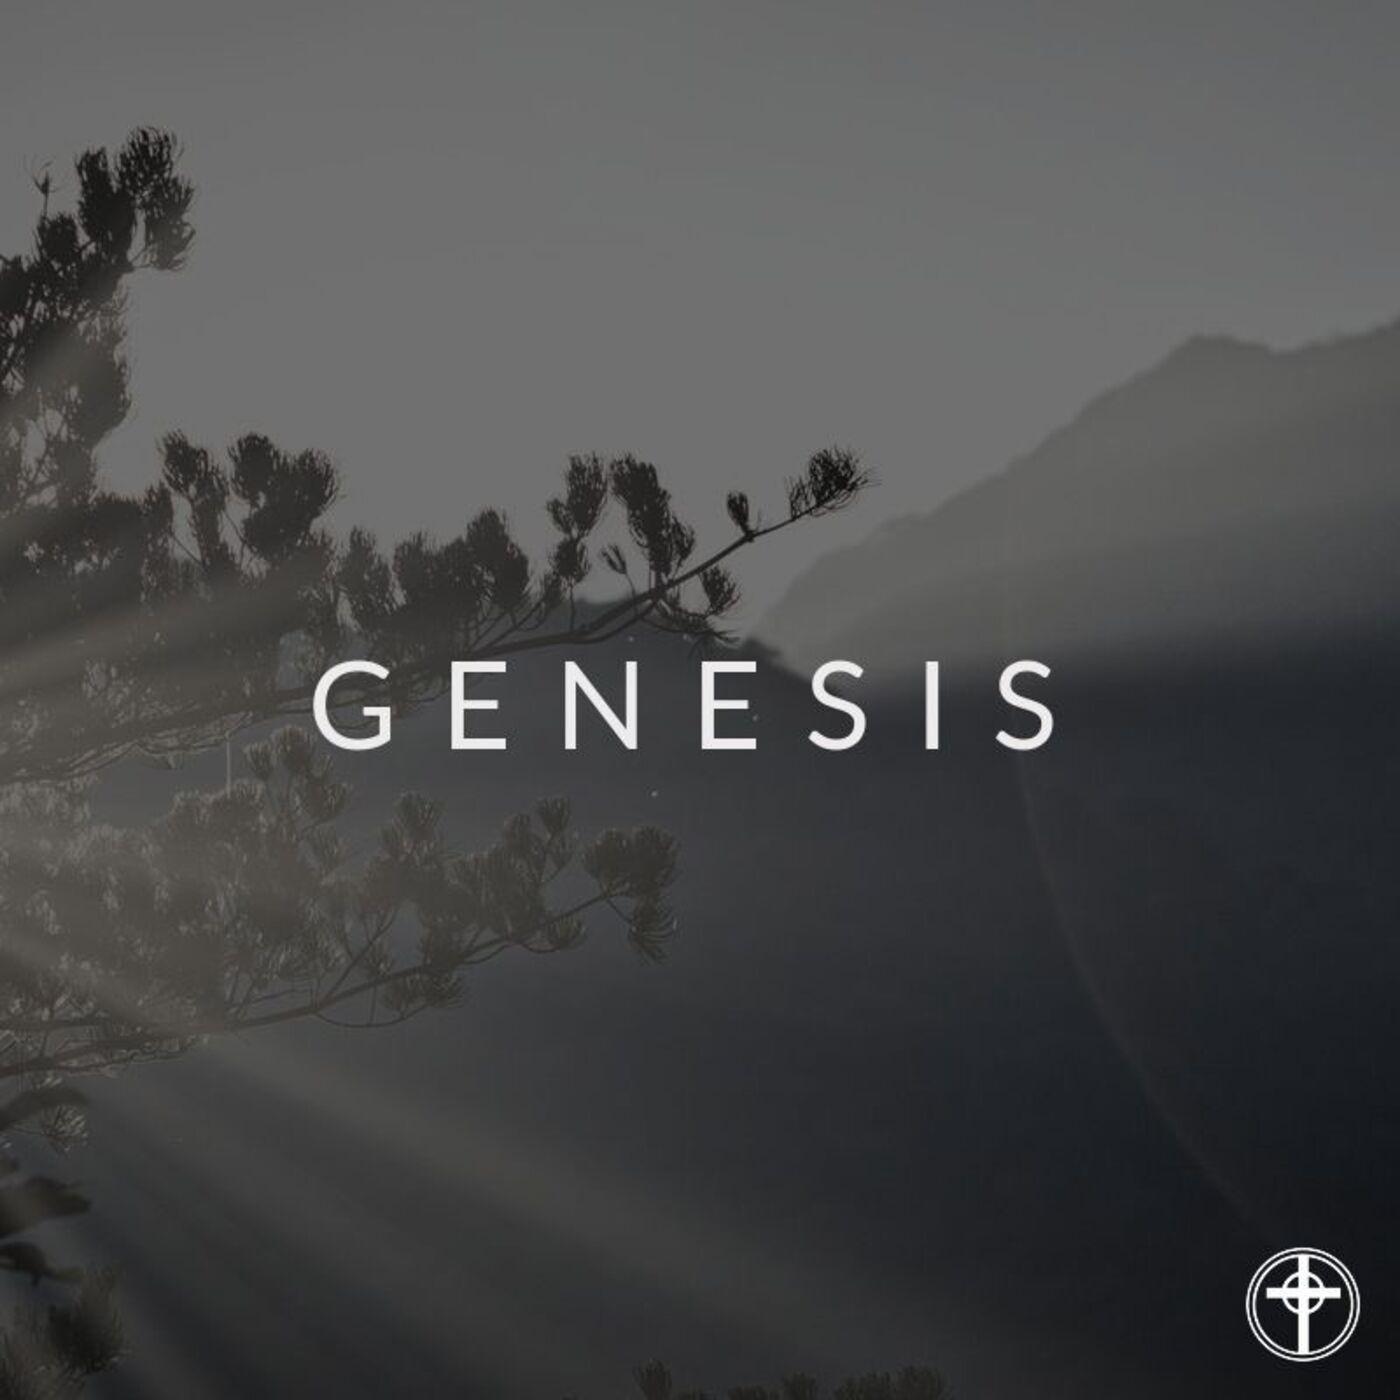 Genesis - Plans and Providence - Genesis 50:15-26